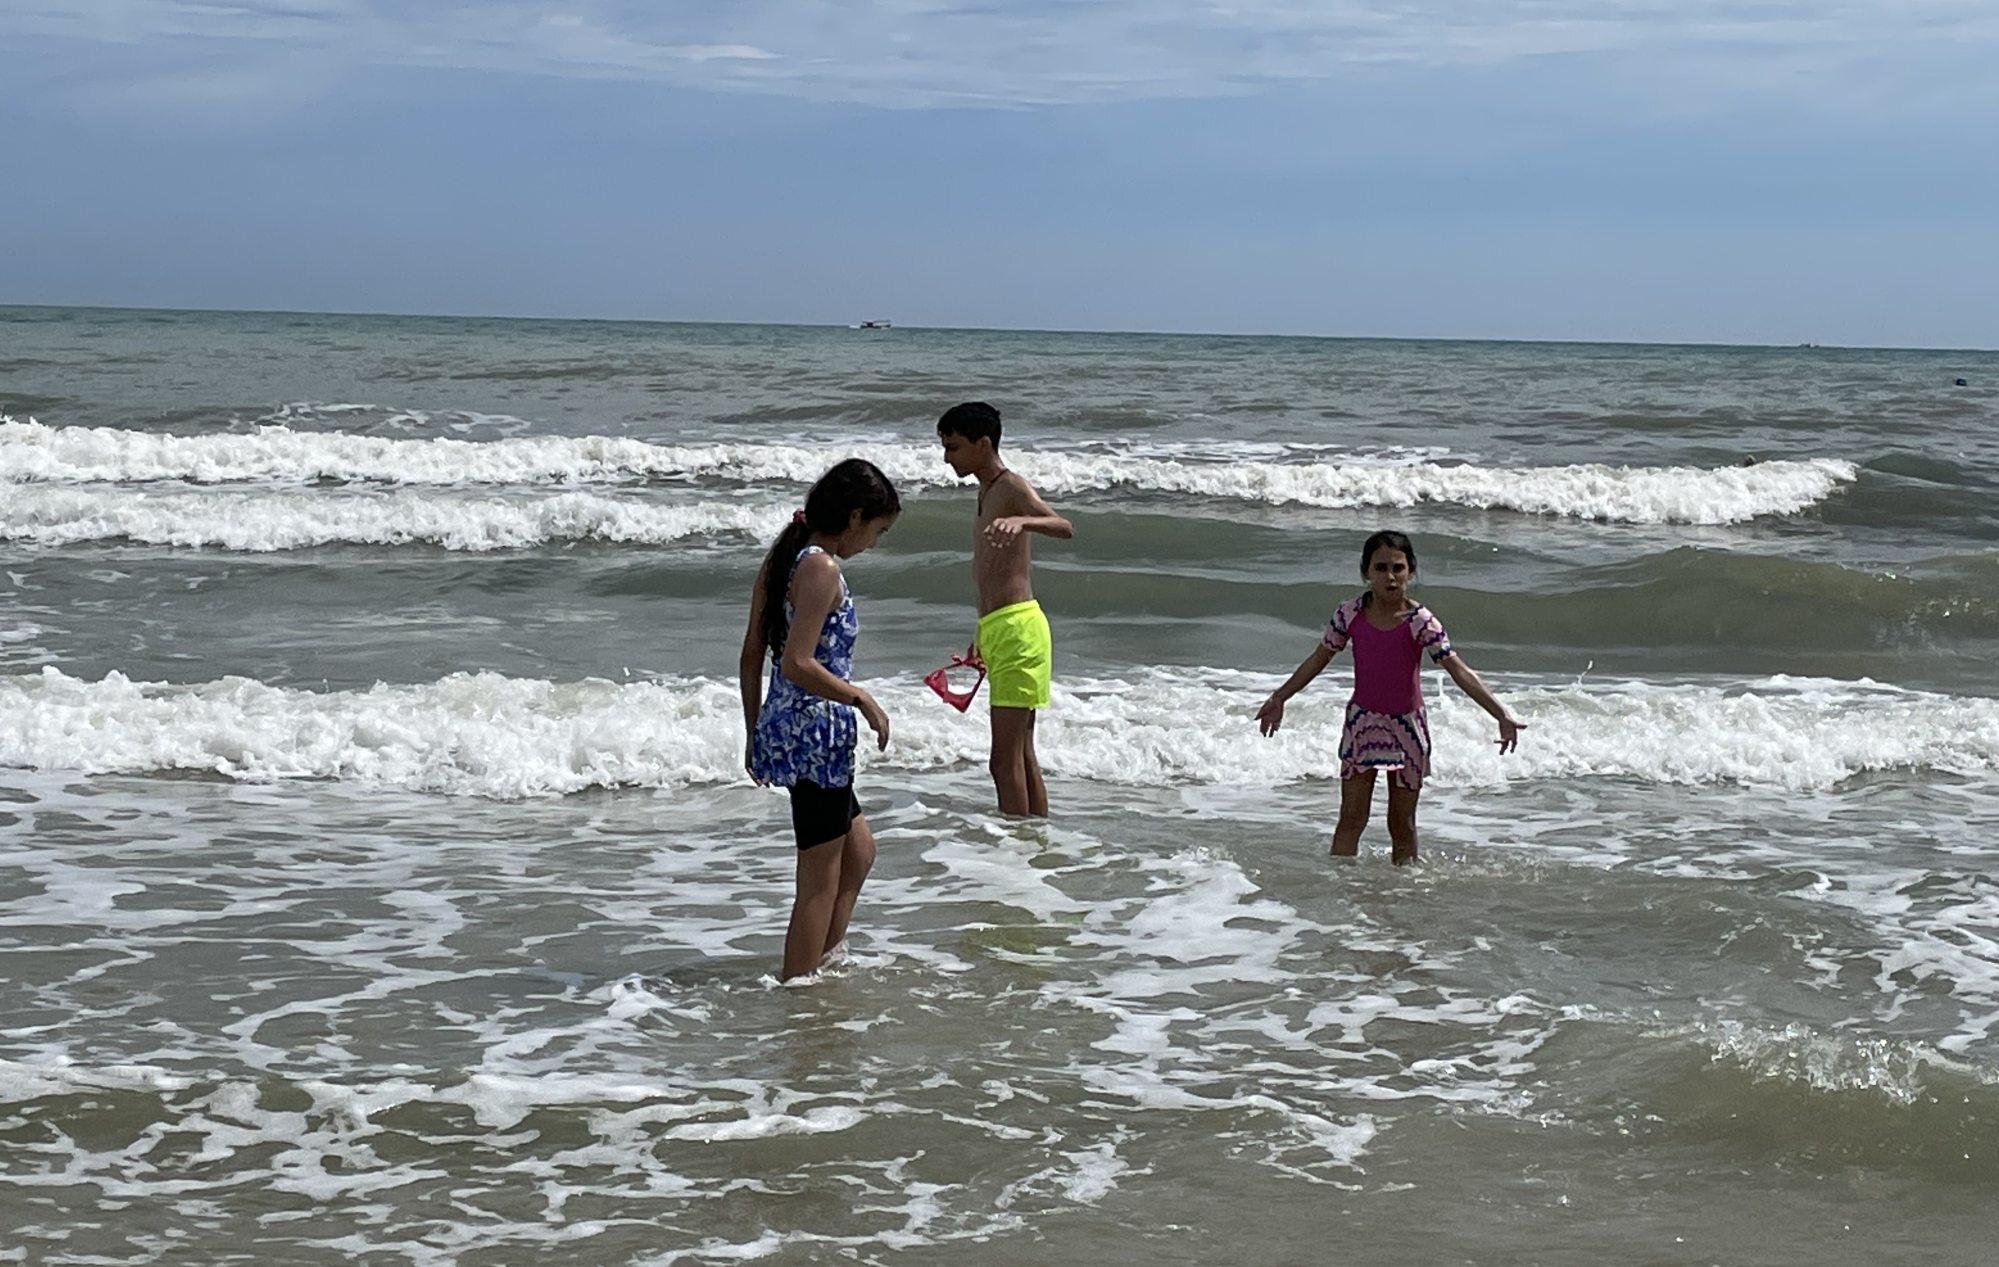 Yaseen, Sanna and Ammal El Muzayen have fun on the beach in Langkawi, Malaysia. Photo: Ziad El Muzayen